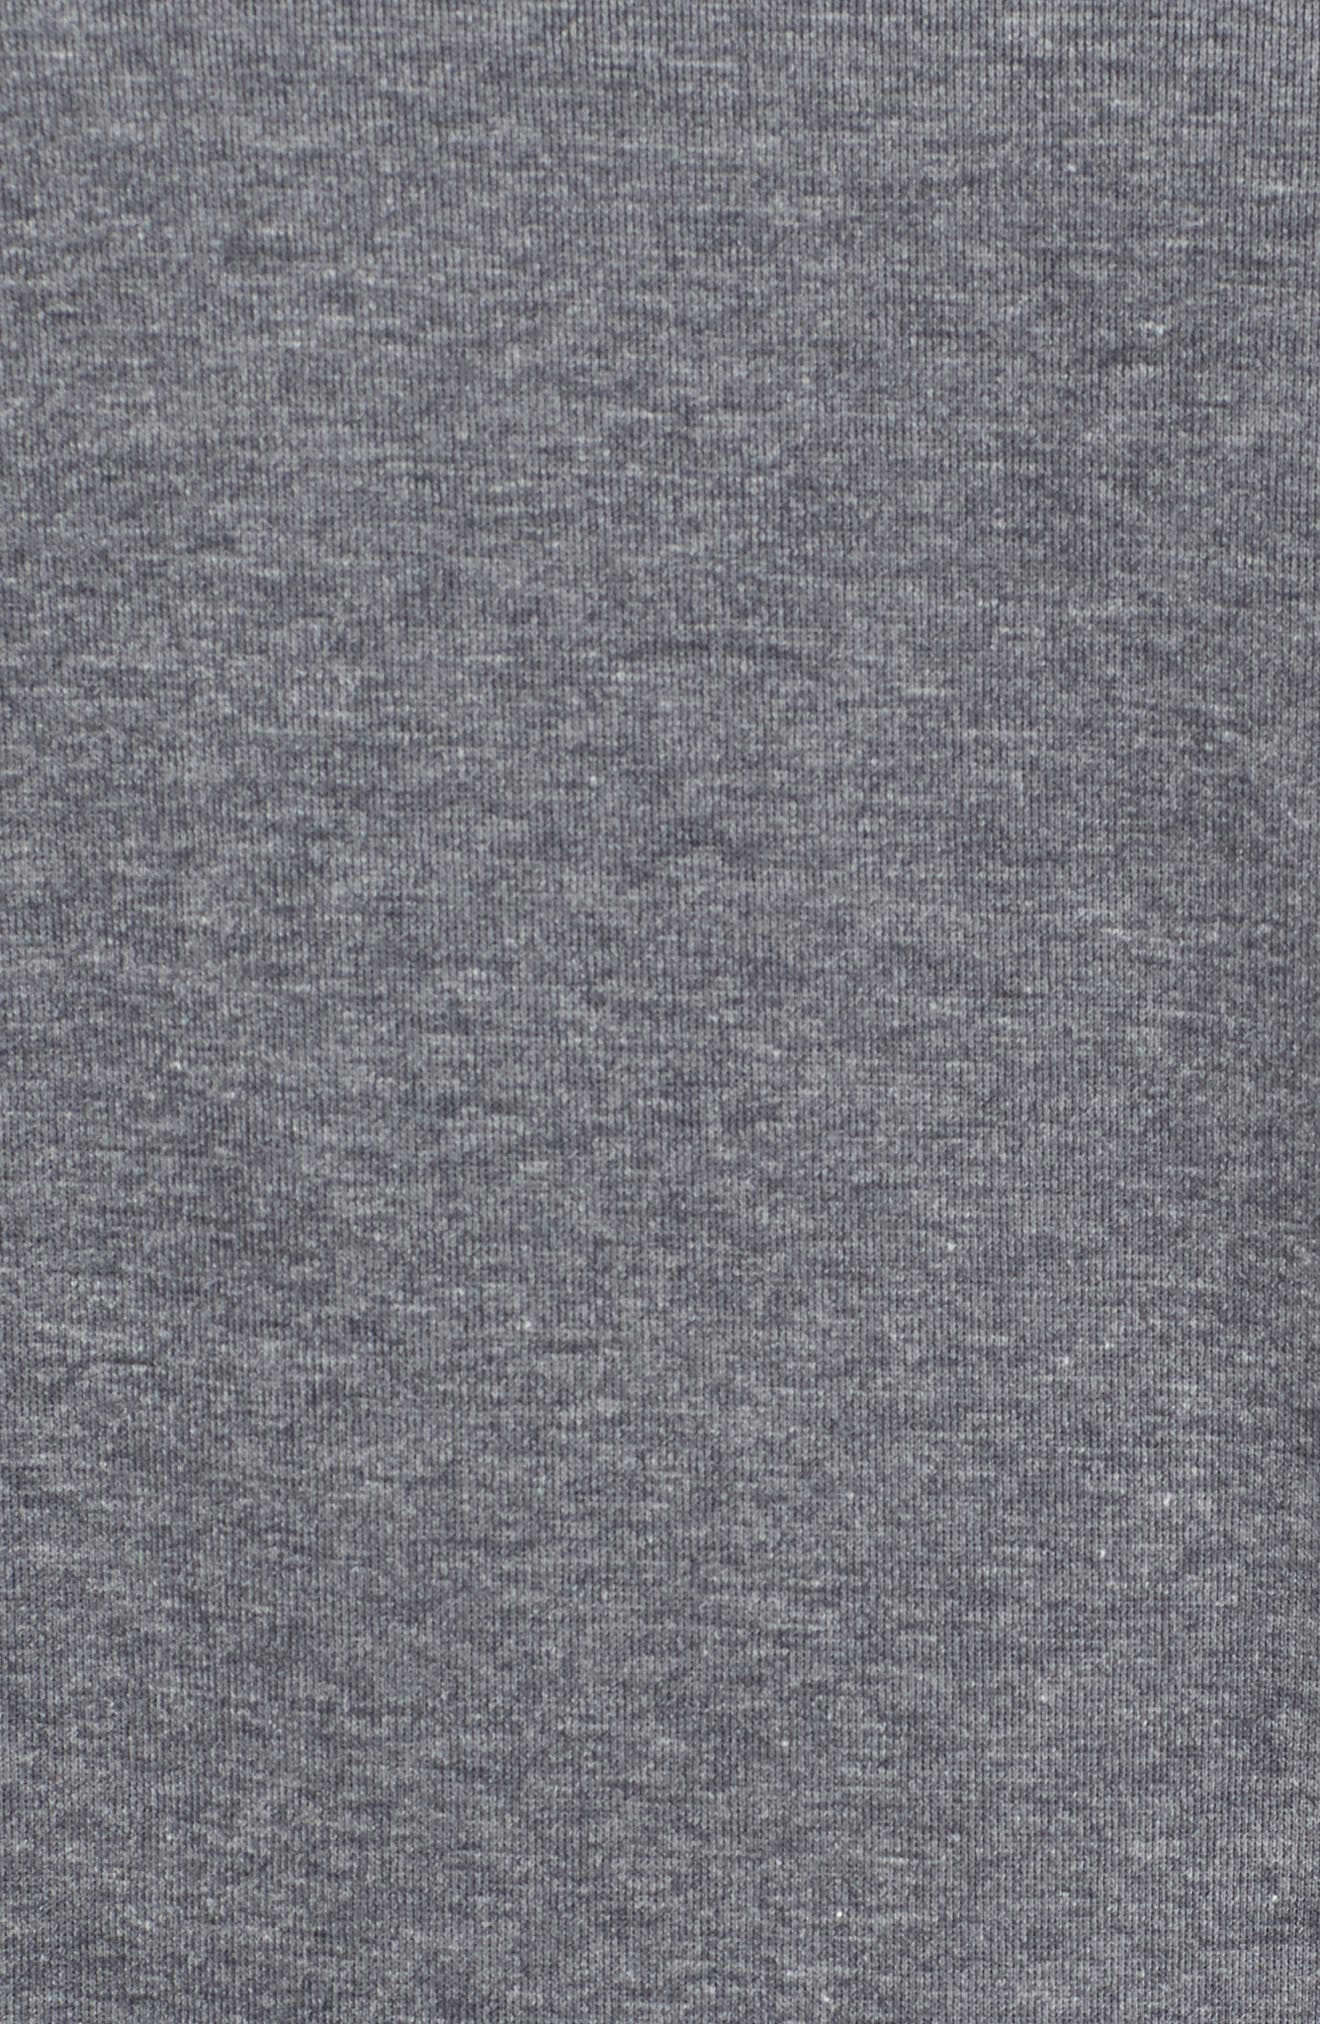 Oversize Sweatshirt,                             Alternate thumbnail 6, color,                             063